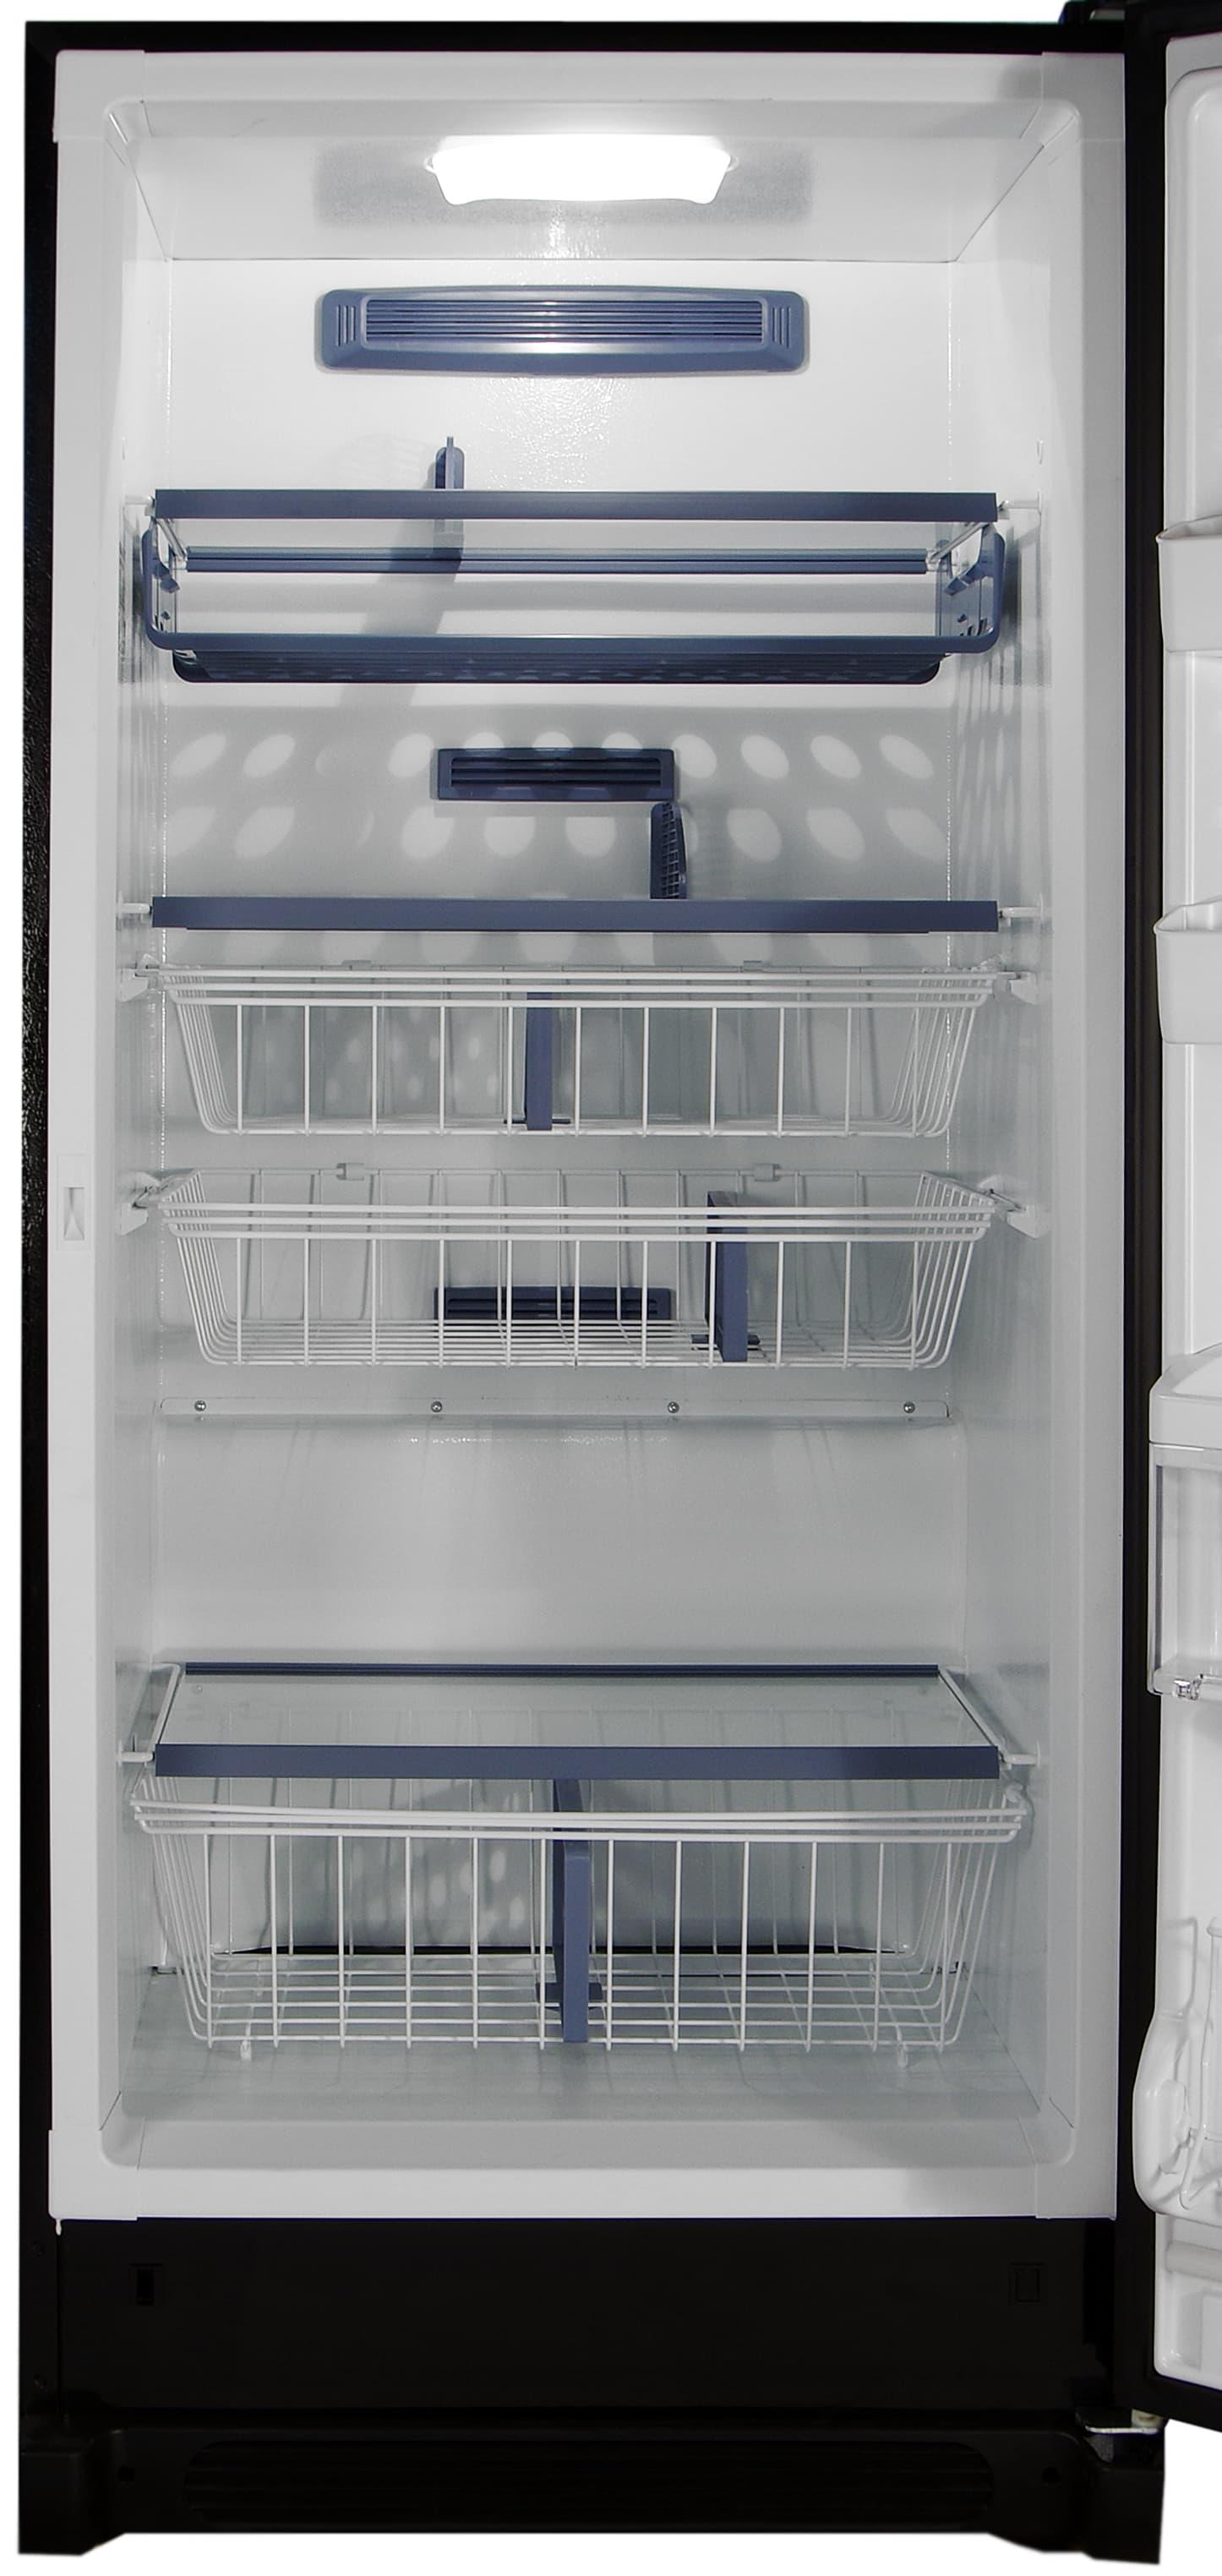 Pizza racks, sliding drawers, glass shelves: it's all found in the Kenmore Elite 28093 freezer.